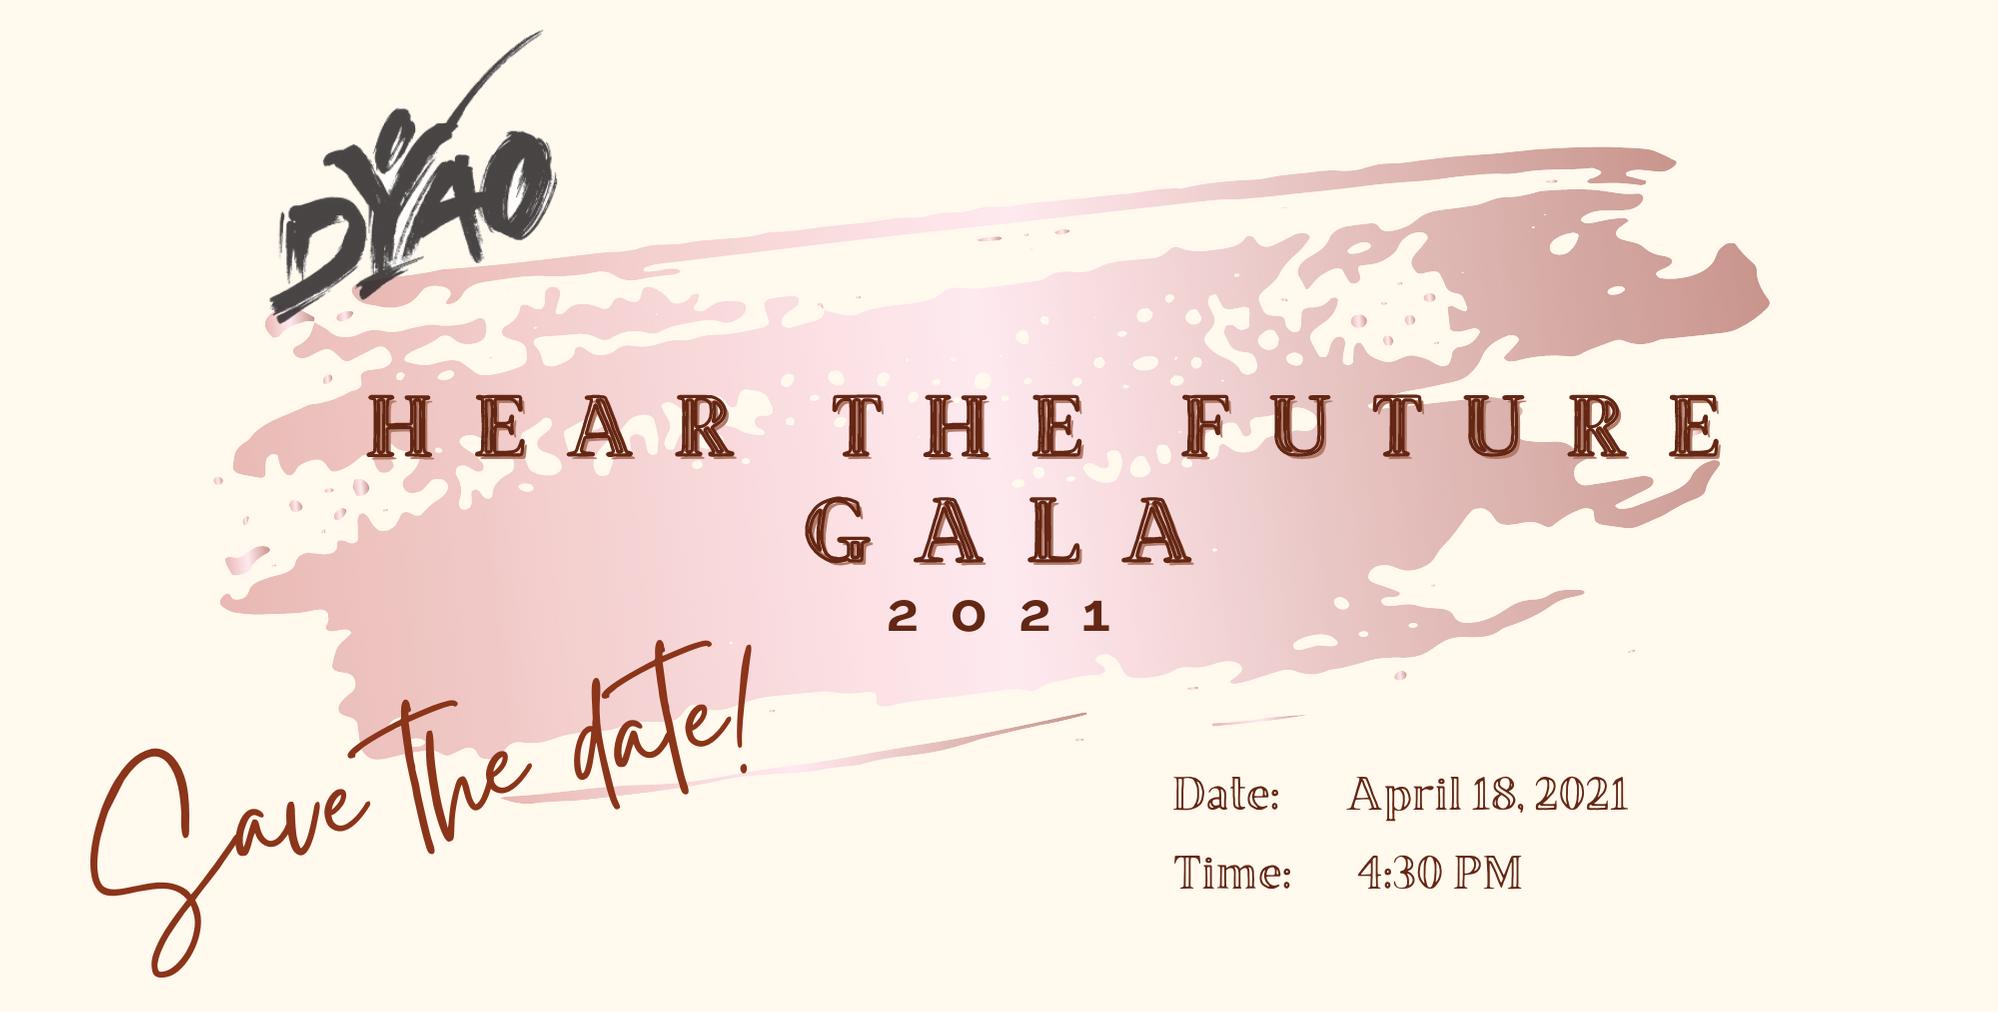 Hear the Future Gala 2021